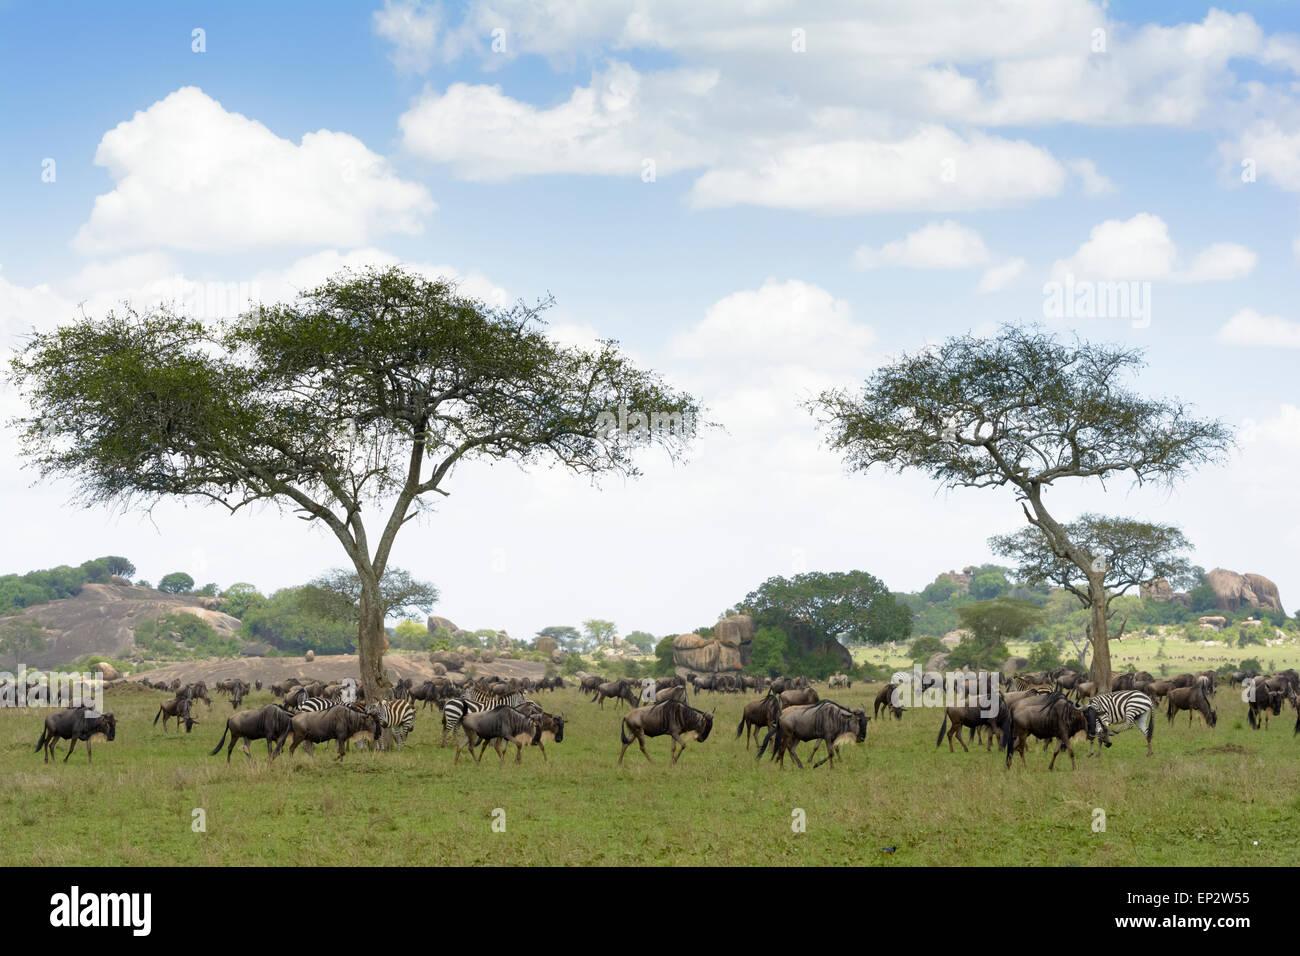 Wildebeest (Connochaetes taurinus) and Zebra (Equus quagga) herds during the migration, koppie and acacia tree, - Stock Image